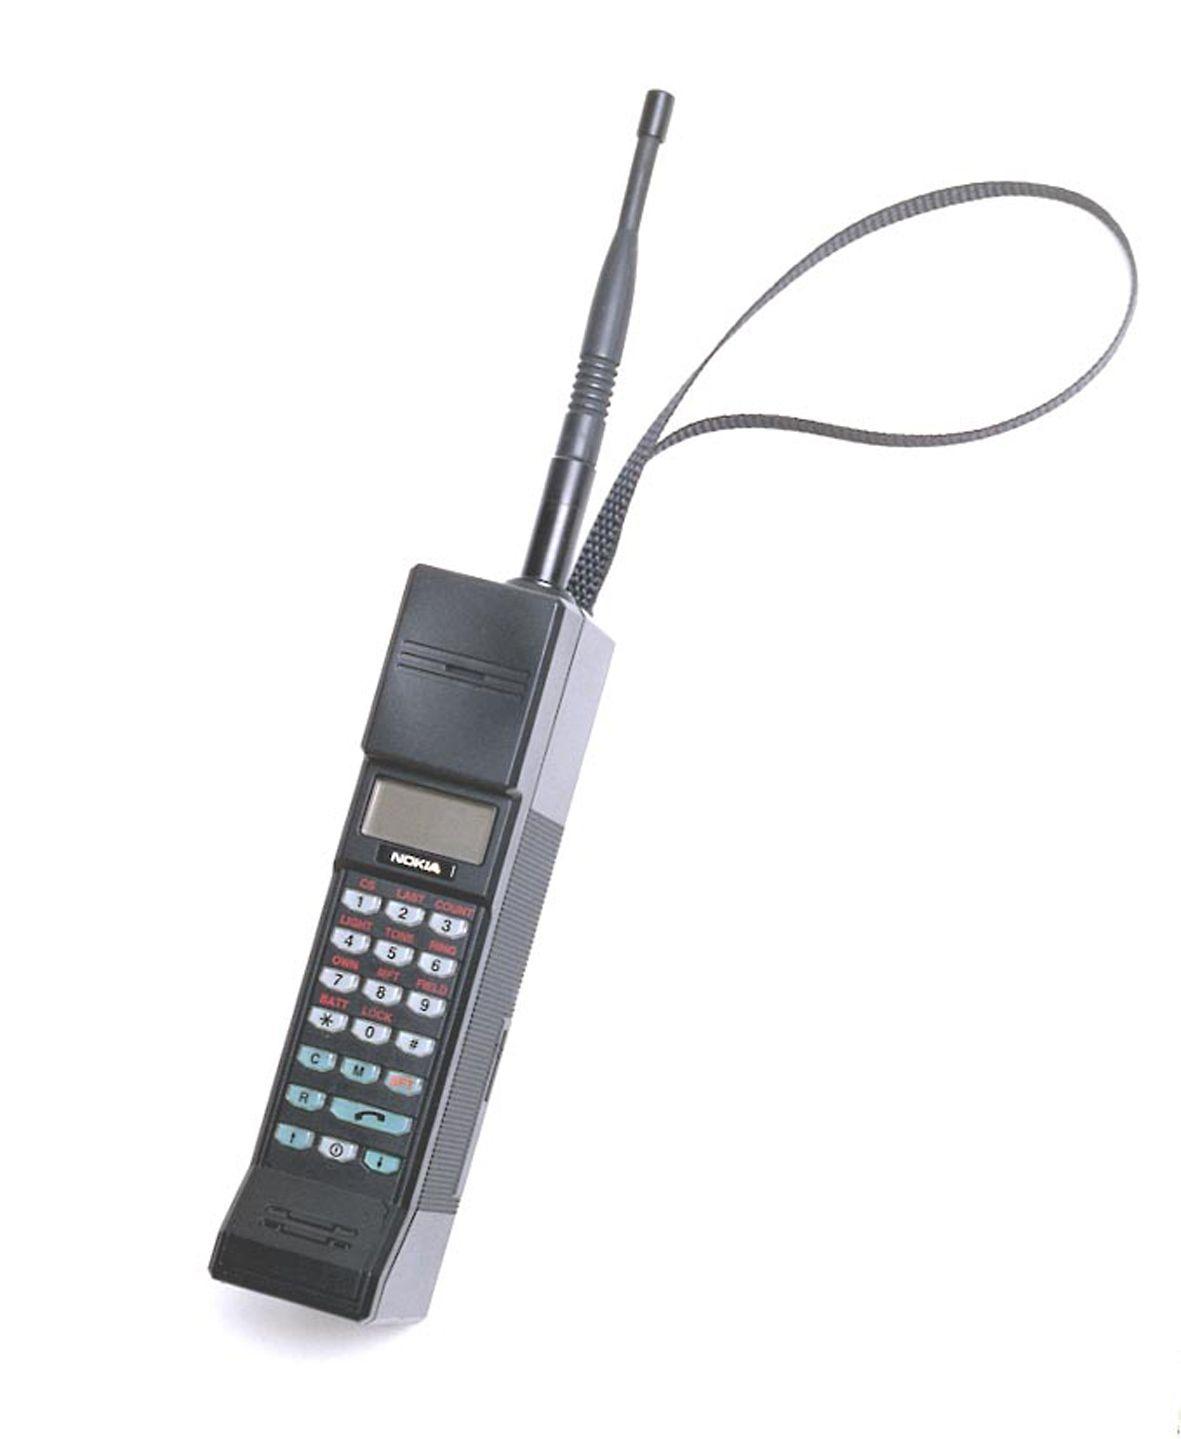 Nokia Mobira Cityman, NMT900-mobil fra 1987.